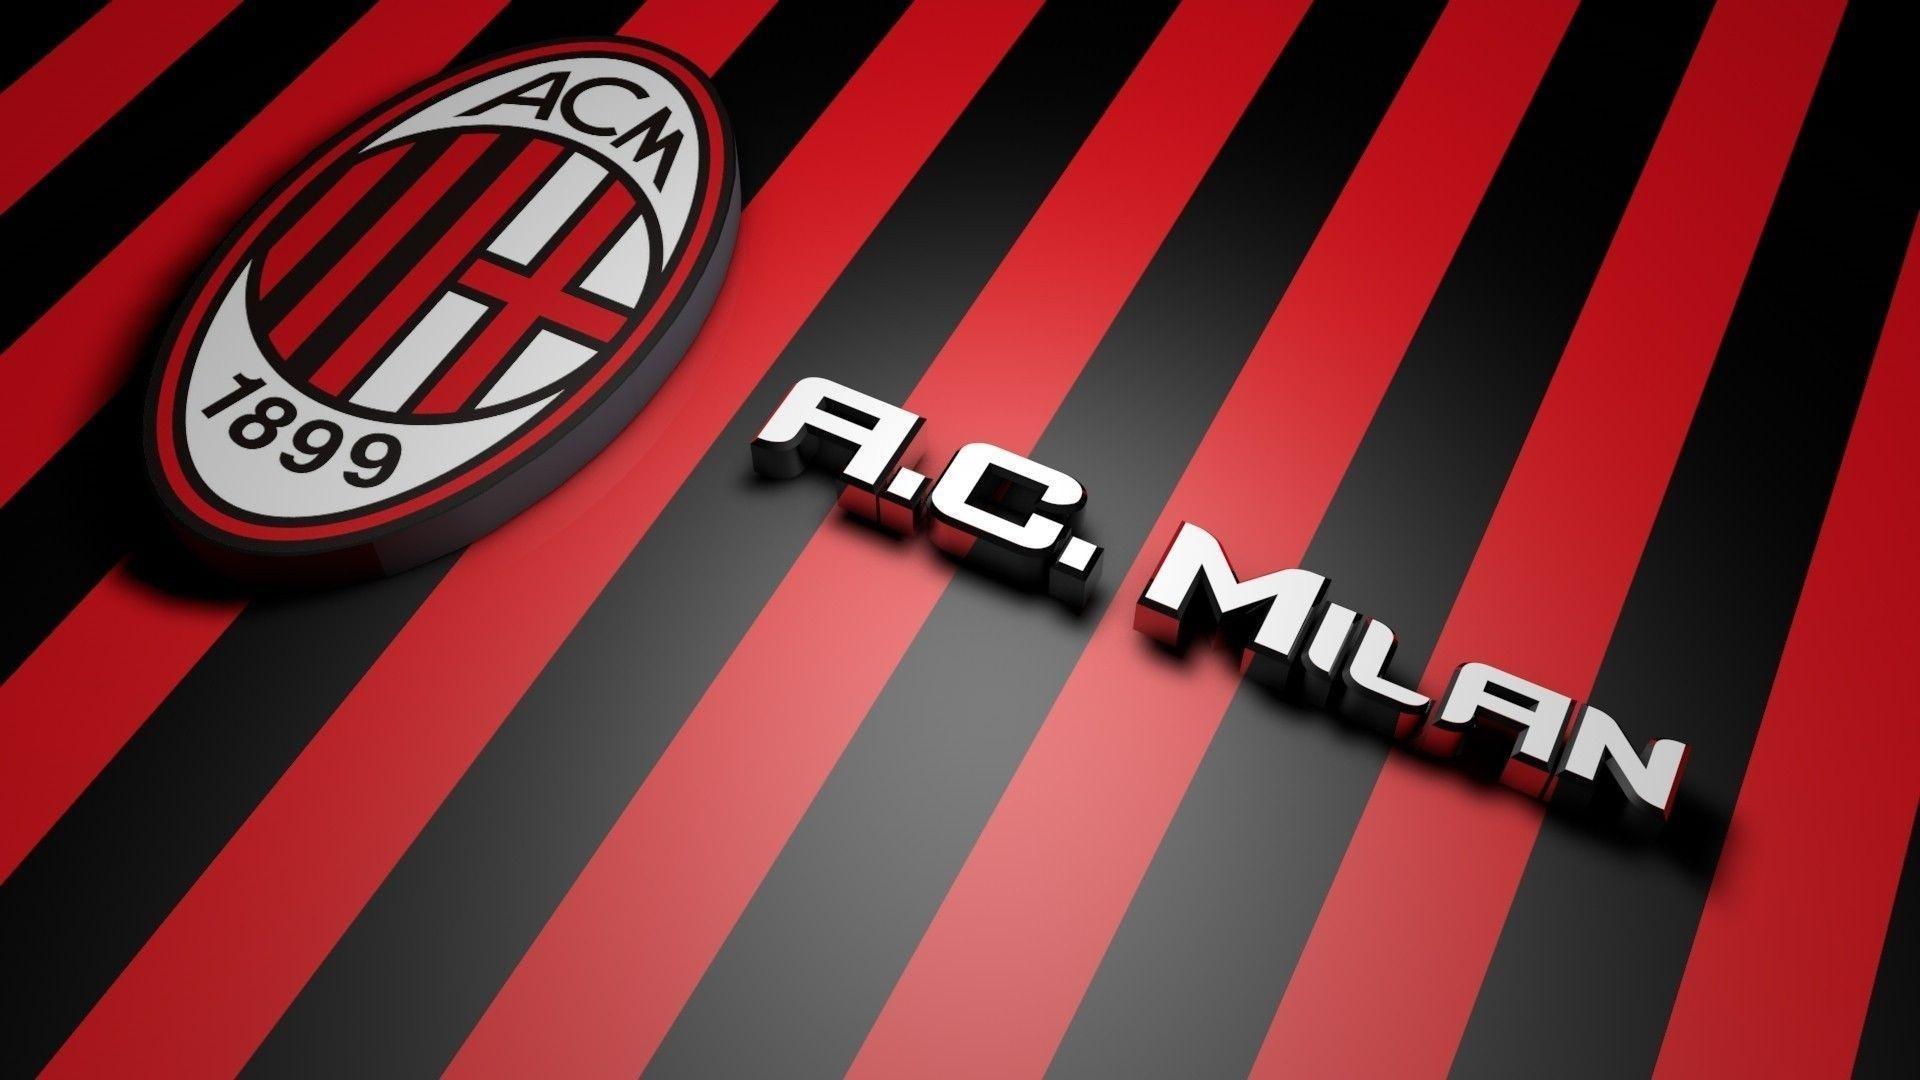 Logo Ac Milan Wallpaper 2018 ·â' WallpaperTag